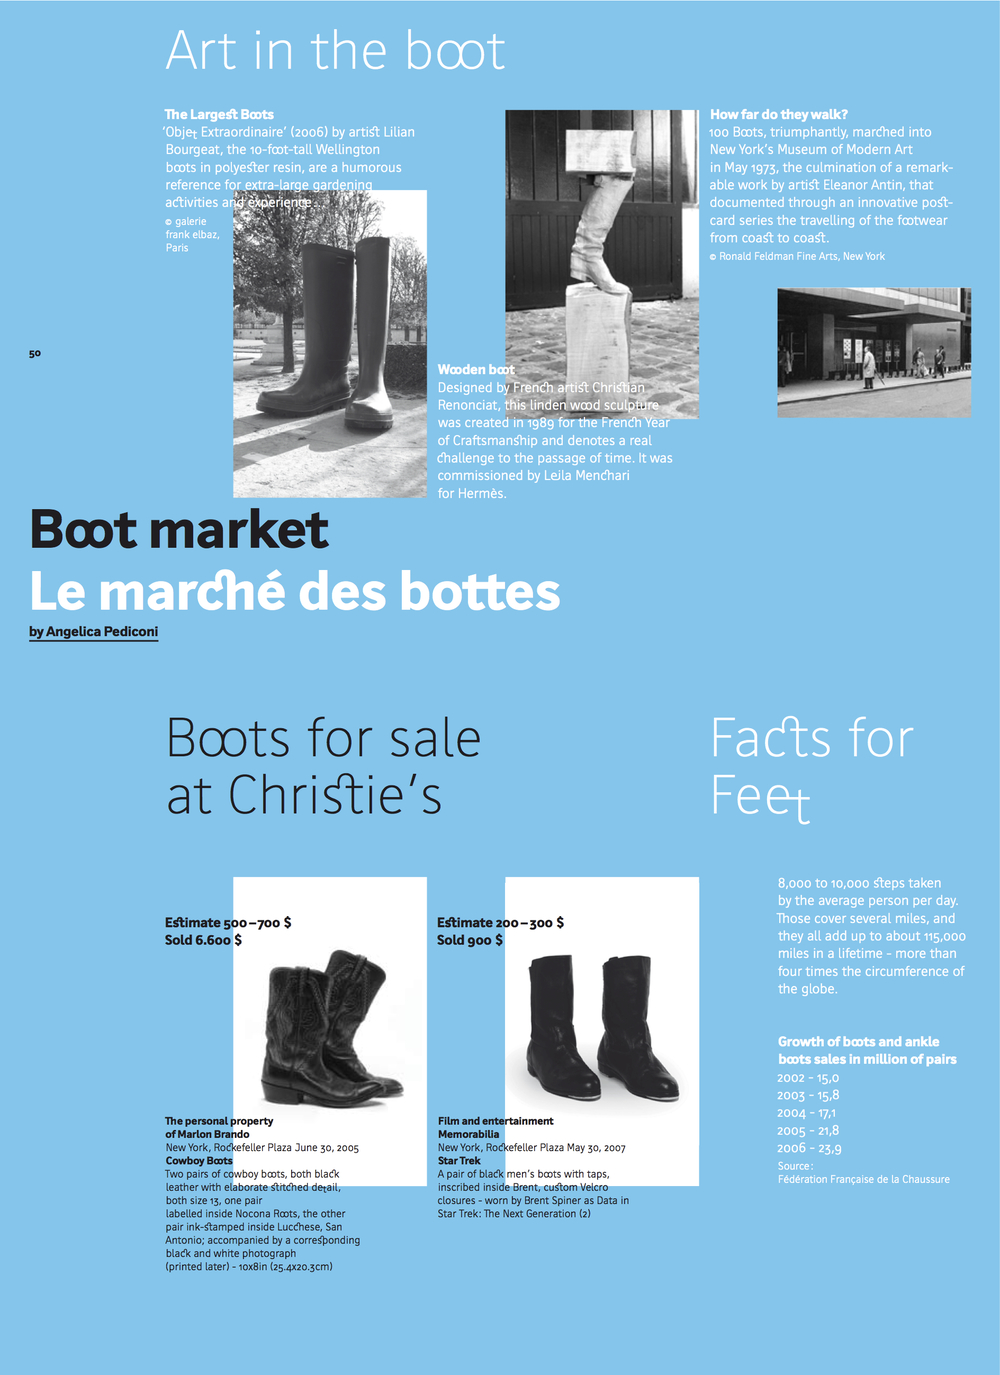 bootmarket.jpg